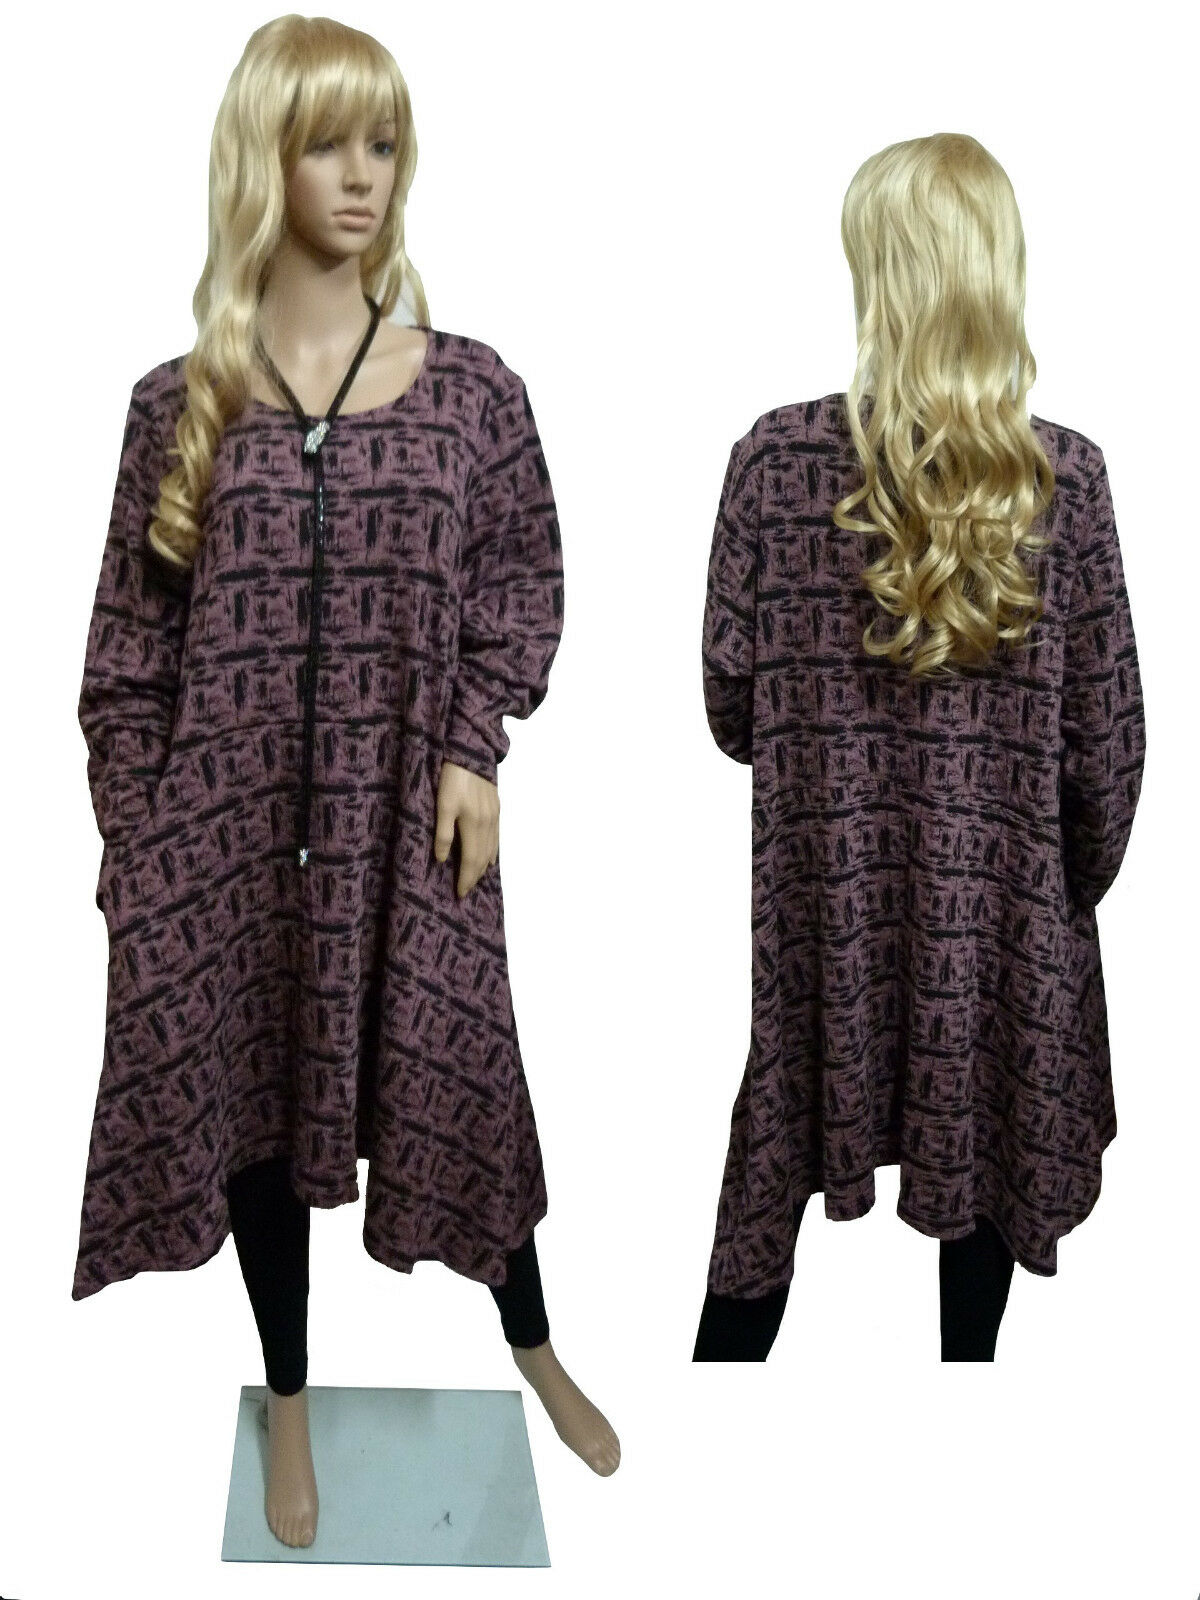 EG 46 48 50 Bella bluee exquisites Kleid Herbst- Winter-Kleid Altpink black